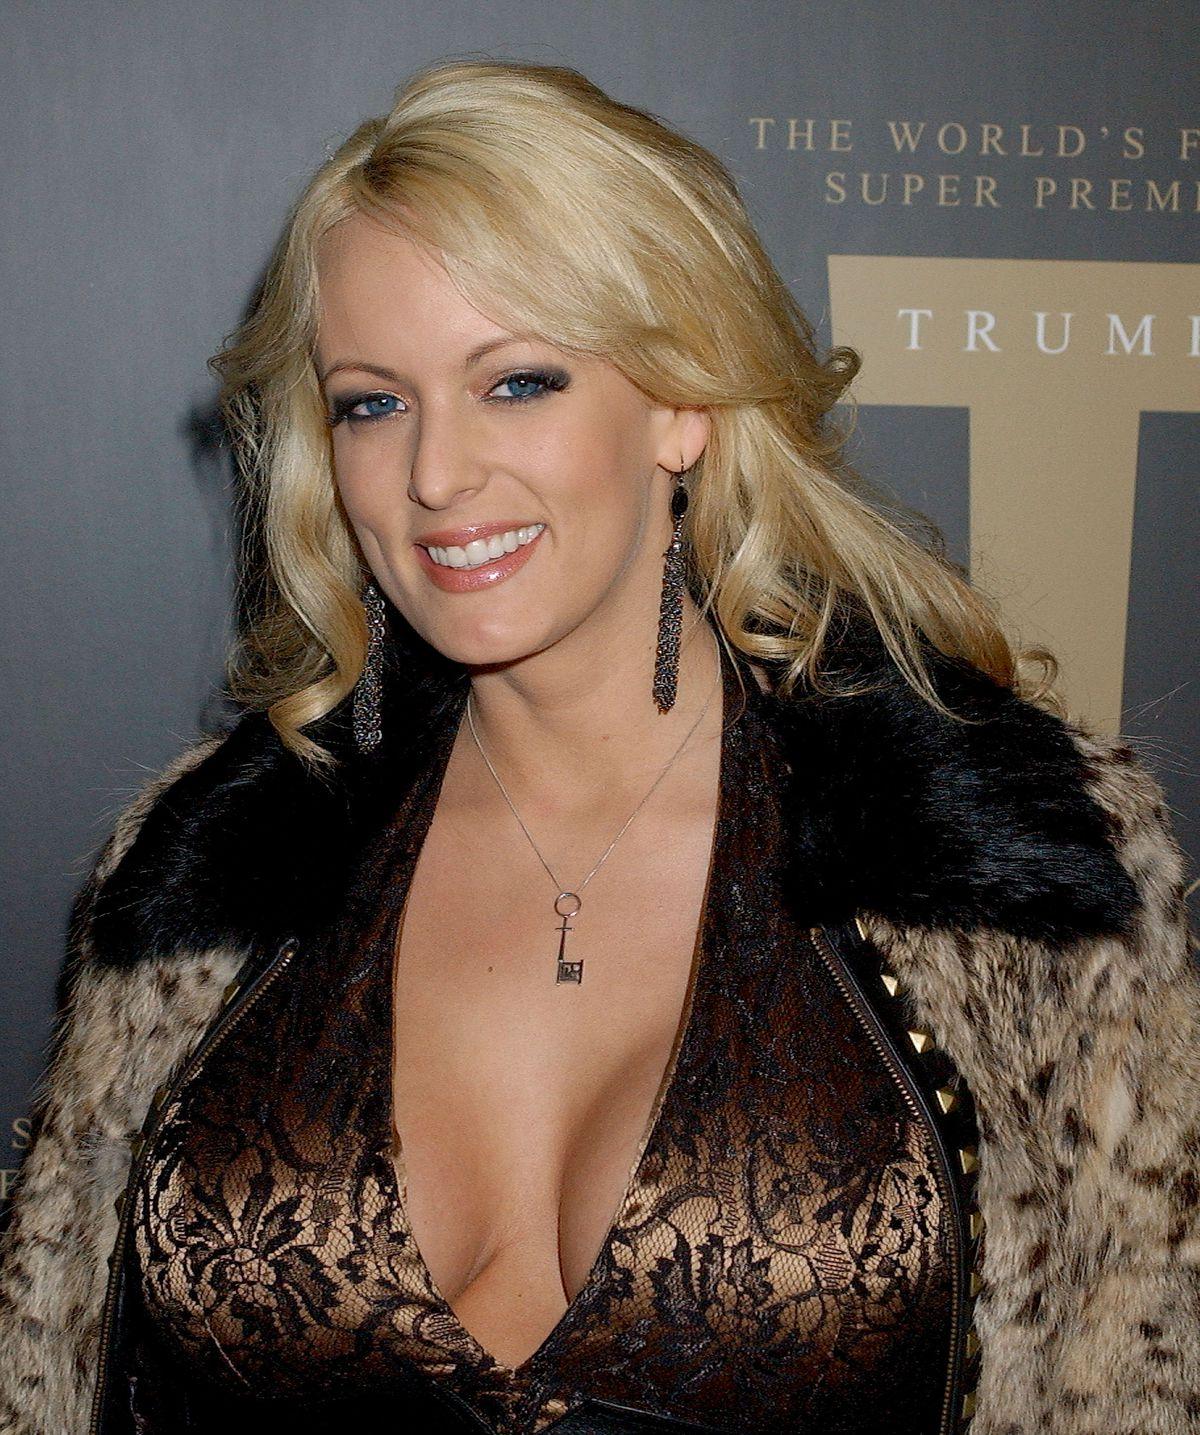 Stormy Daniels: Donald Trump's porn actress lawsuit scandal